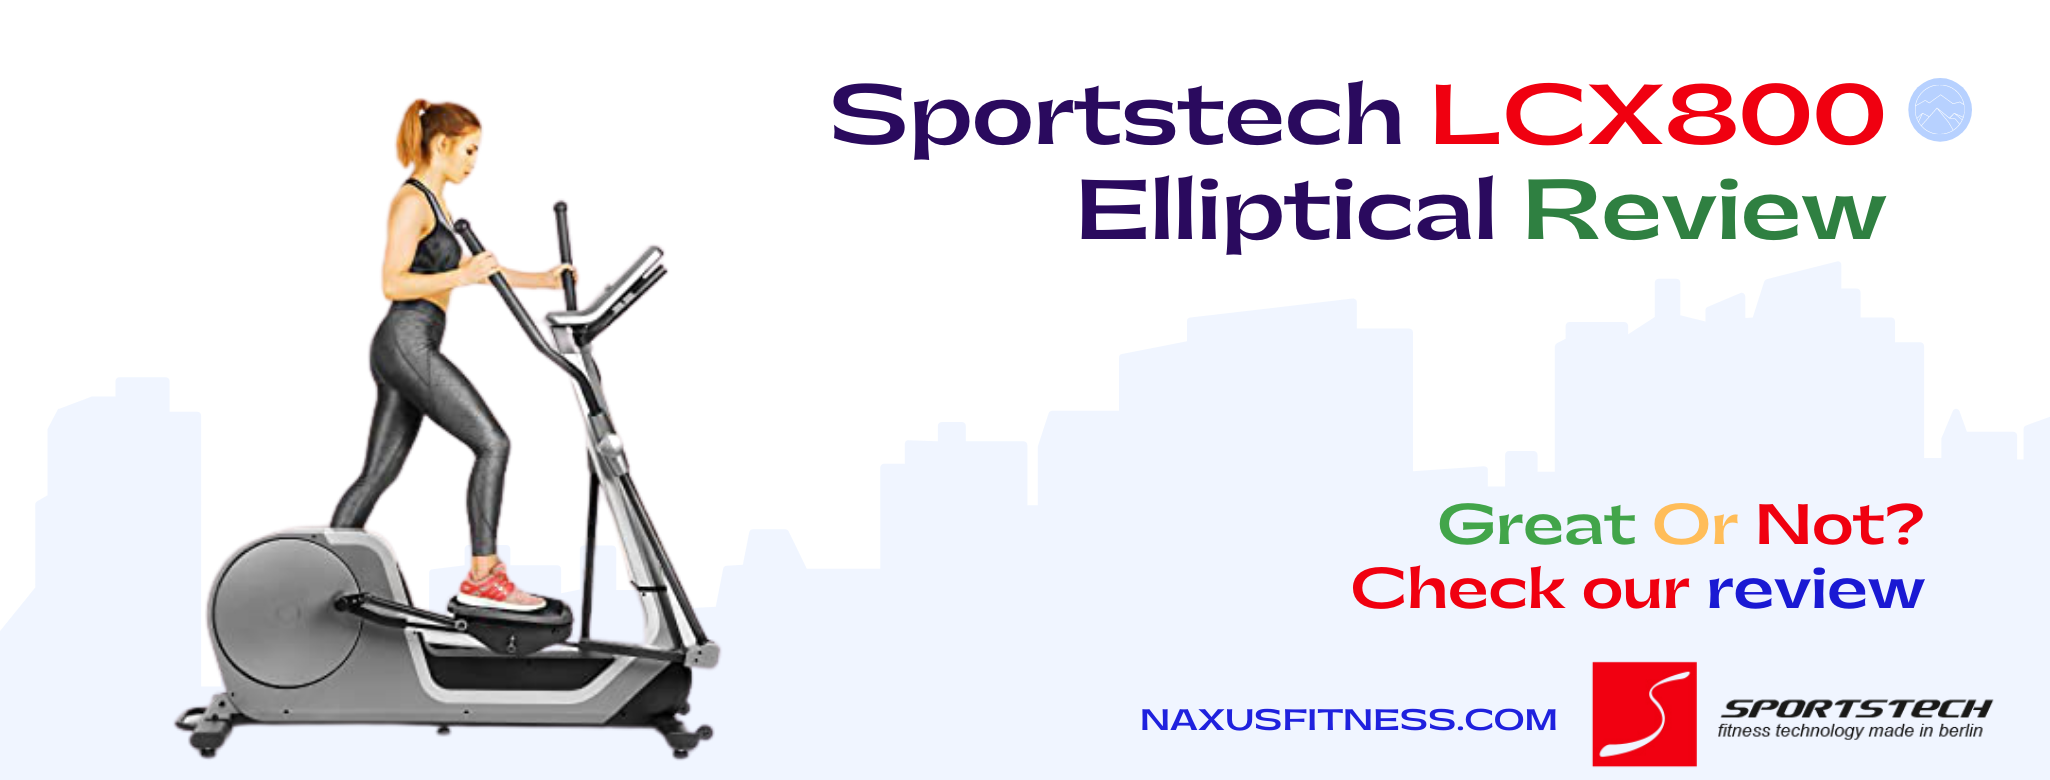 Sportstech LCX800 Elliptical Review